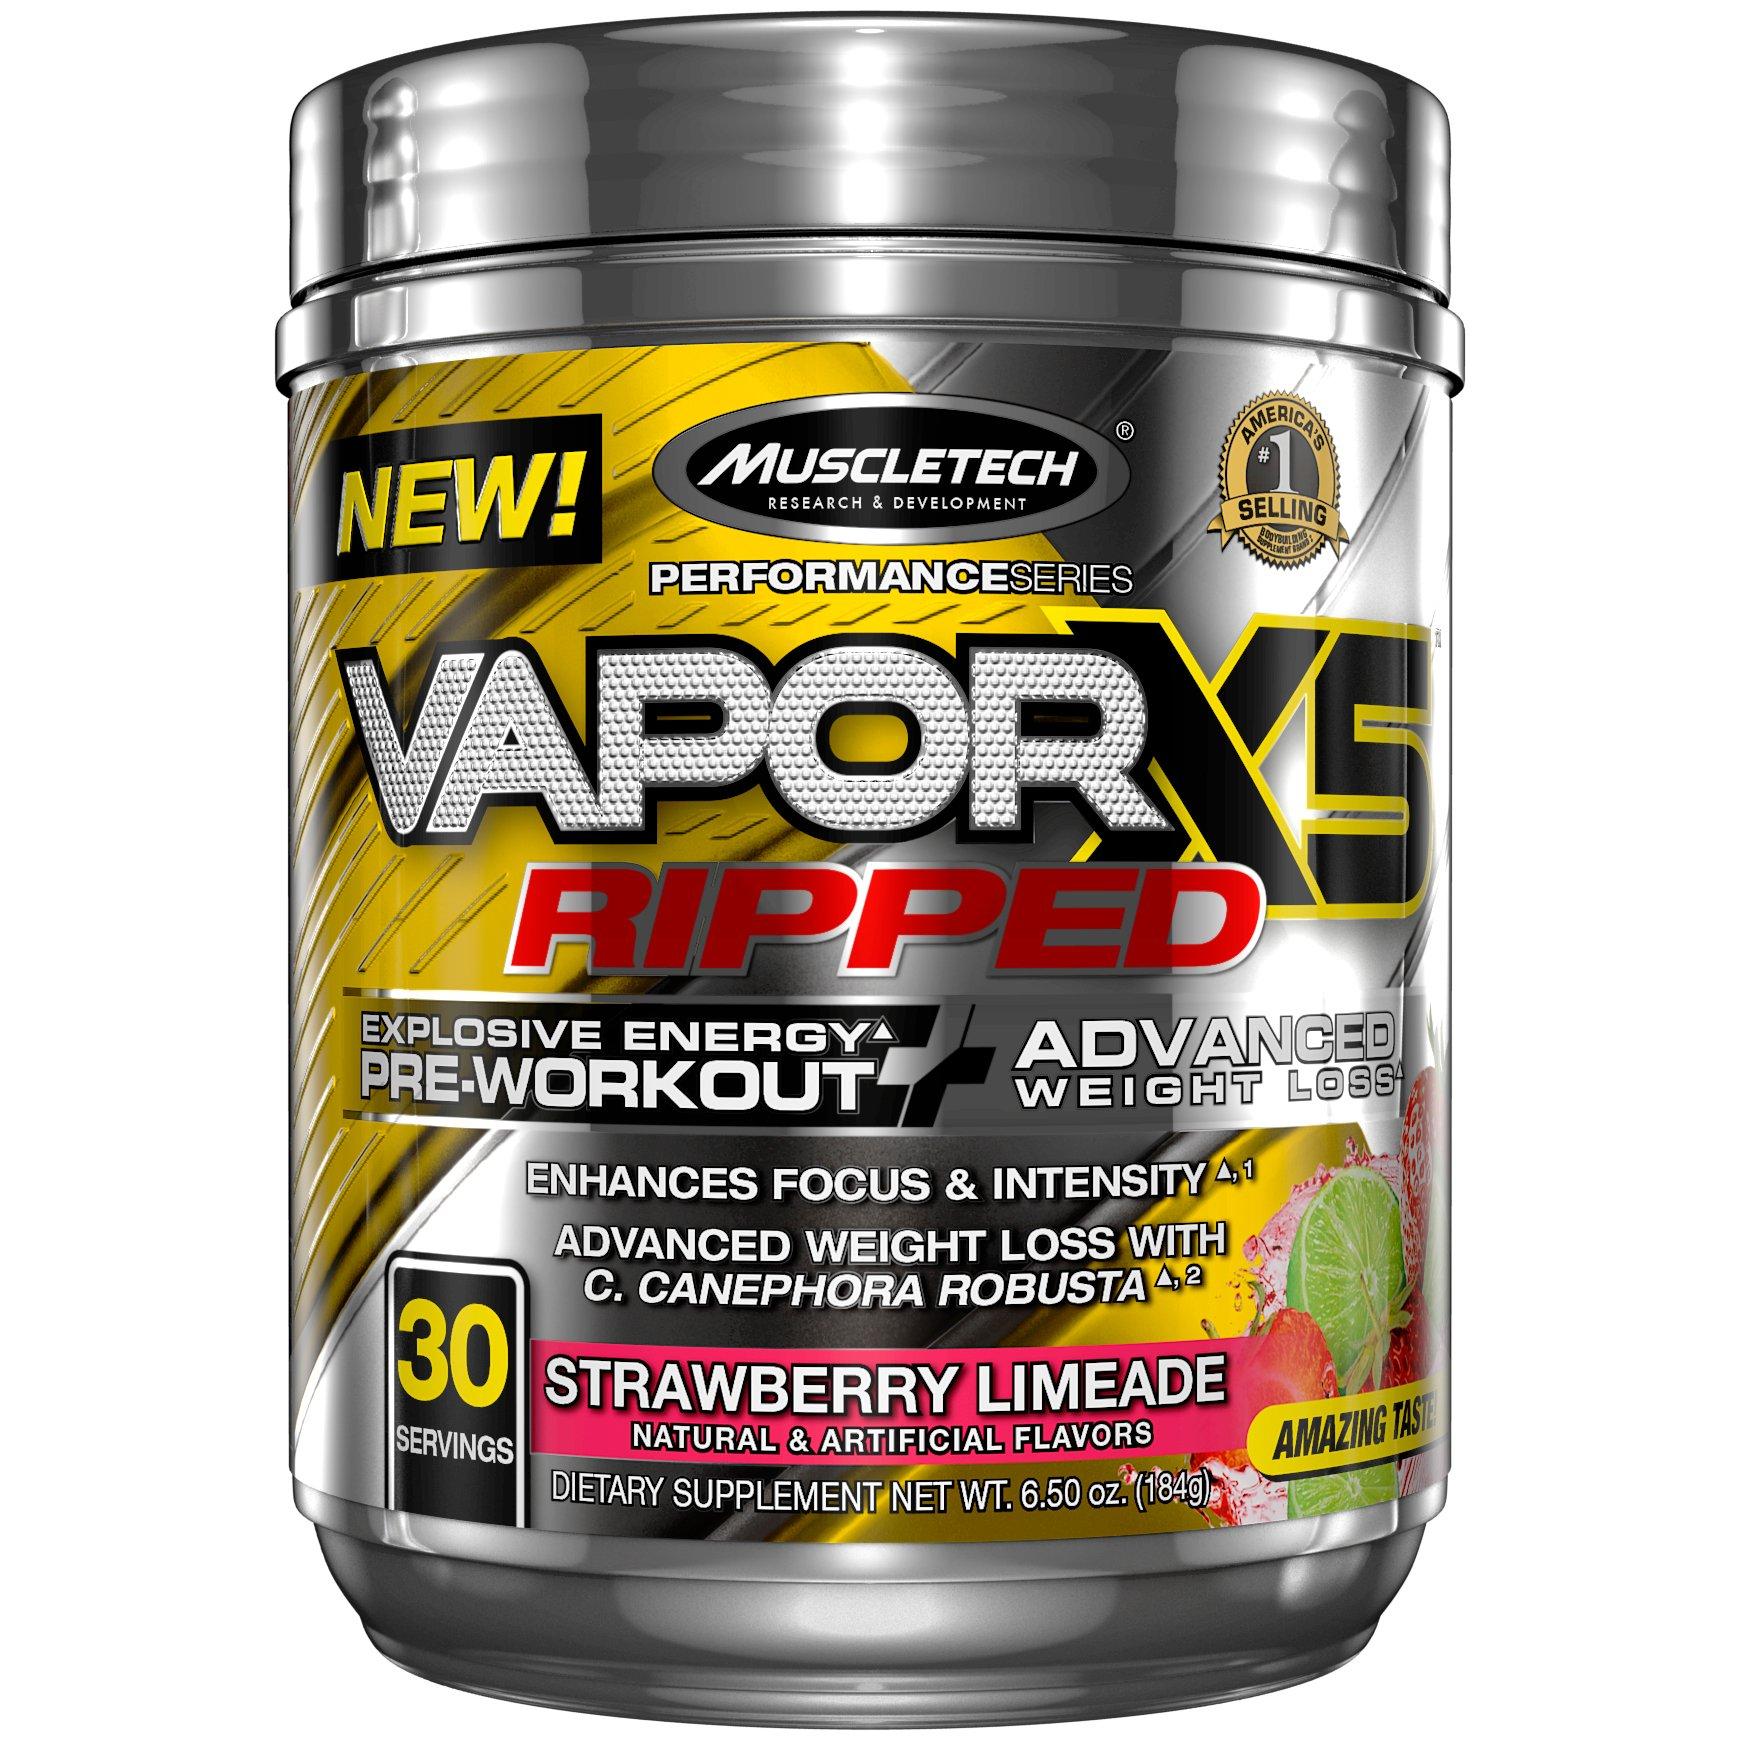 MuscleTech Vapor X5 Next Gen Pre Workout Powder & Weight Loss Supplement, Explosive Energy & Advanced Weight Loss, Strawberry Limeade, 30 Servings,6.50 Ounce,Pack of 1 by MuscleTech